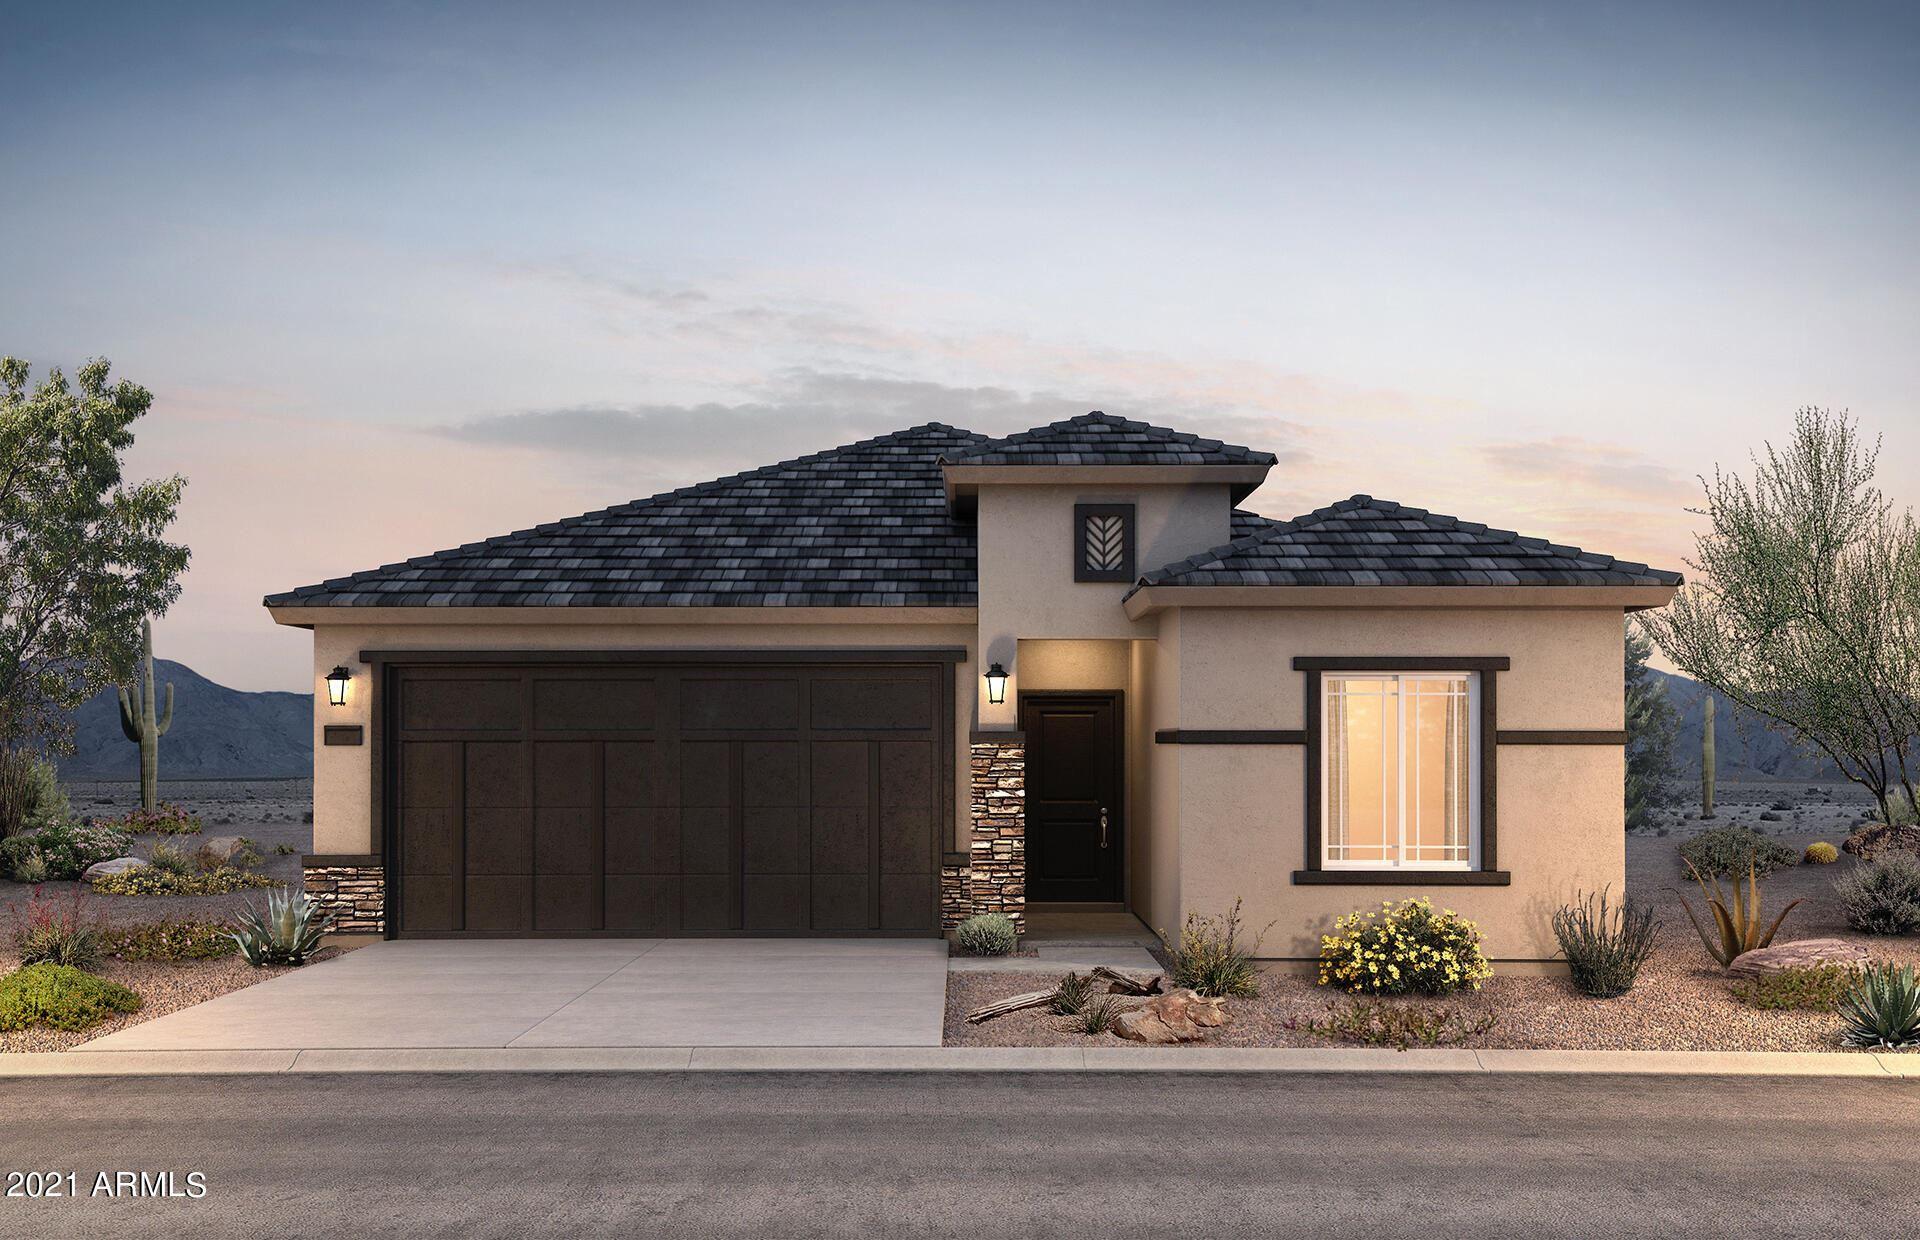 Photo for 43621 W ACACIA Avenue, Maricopa, AZ 85138 (MLS # 6290558)